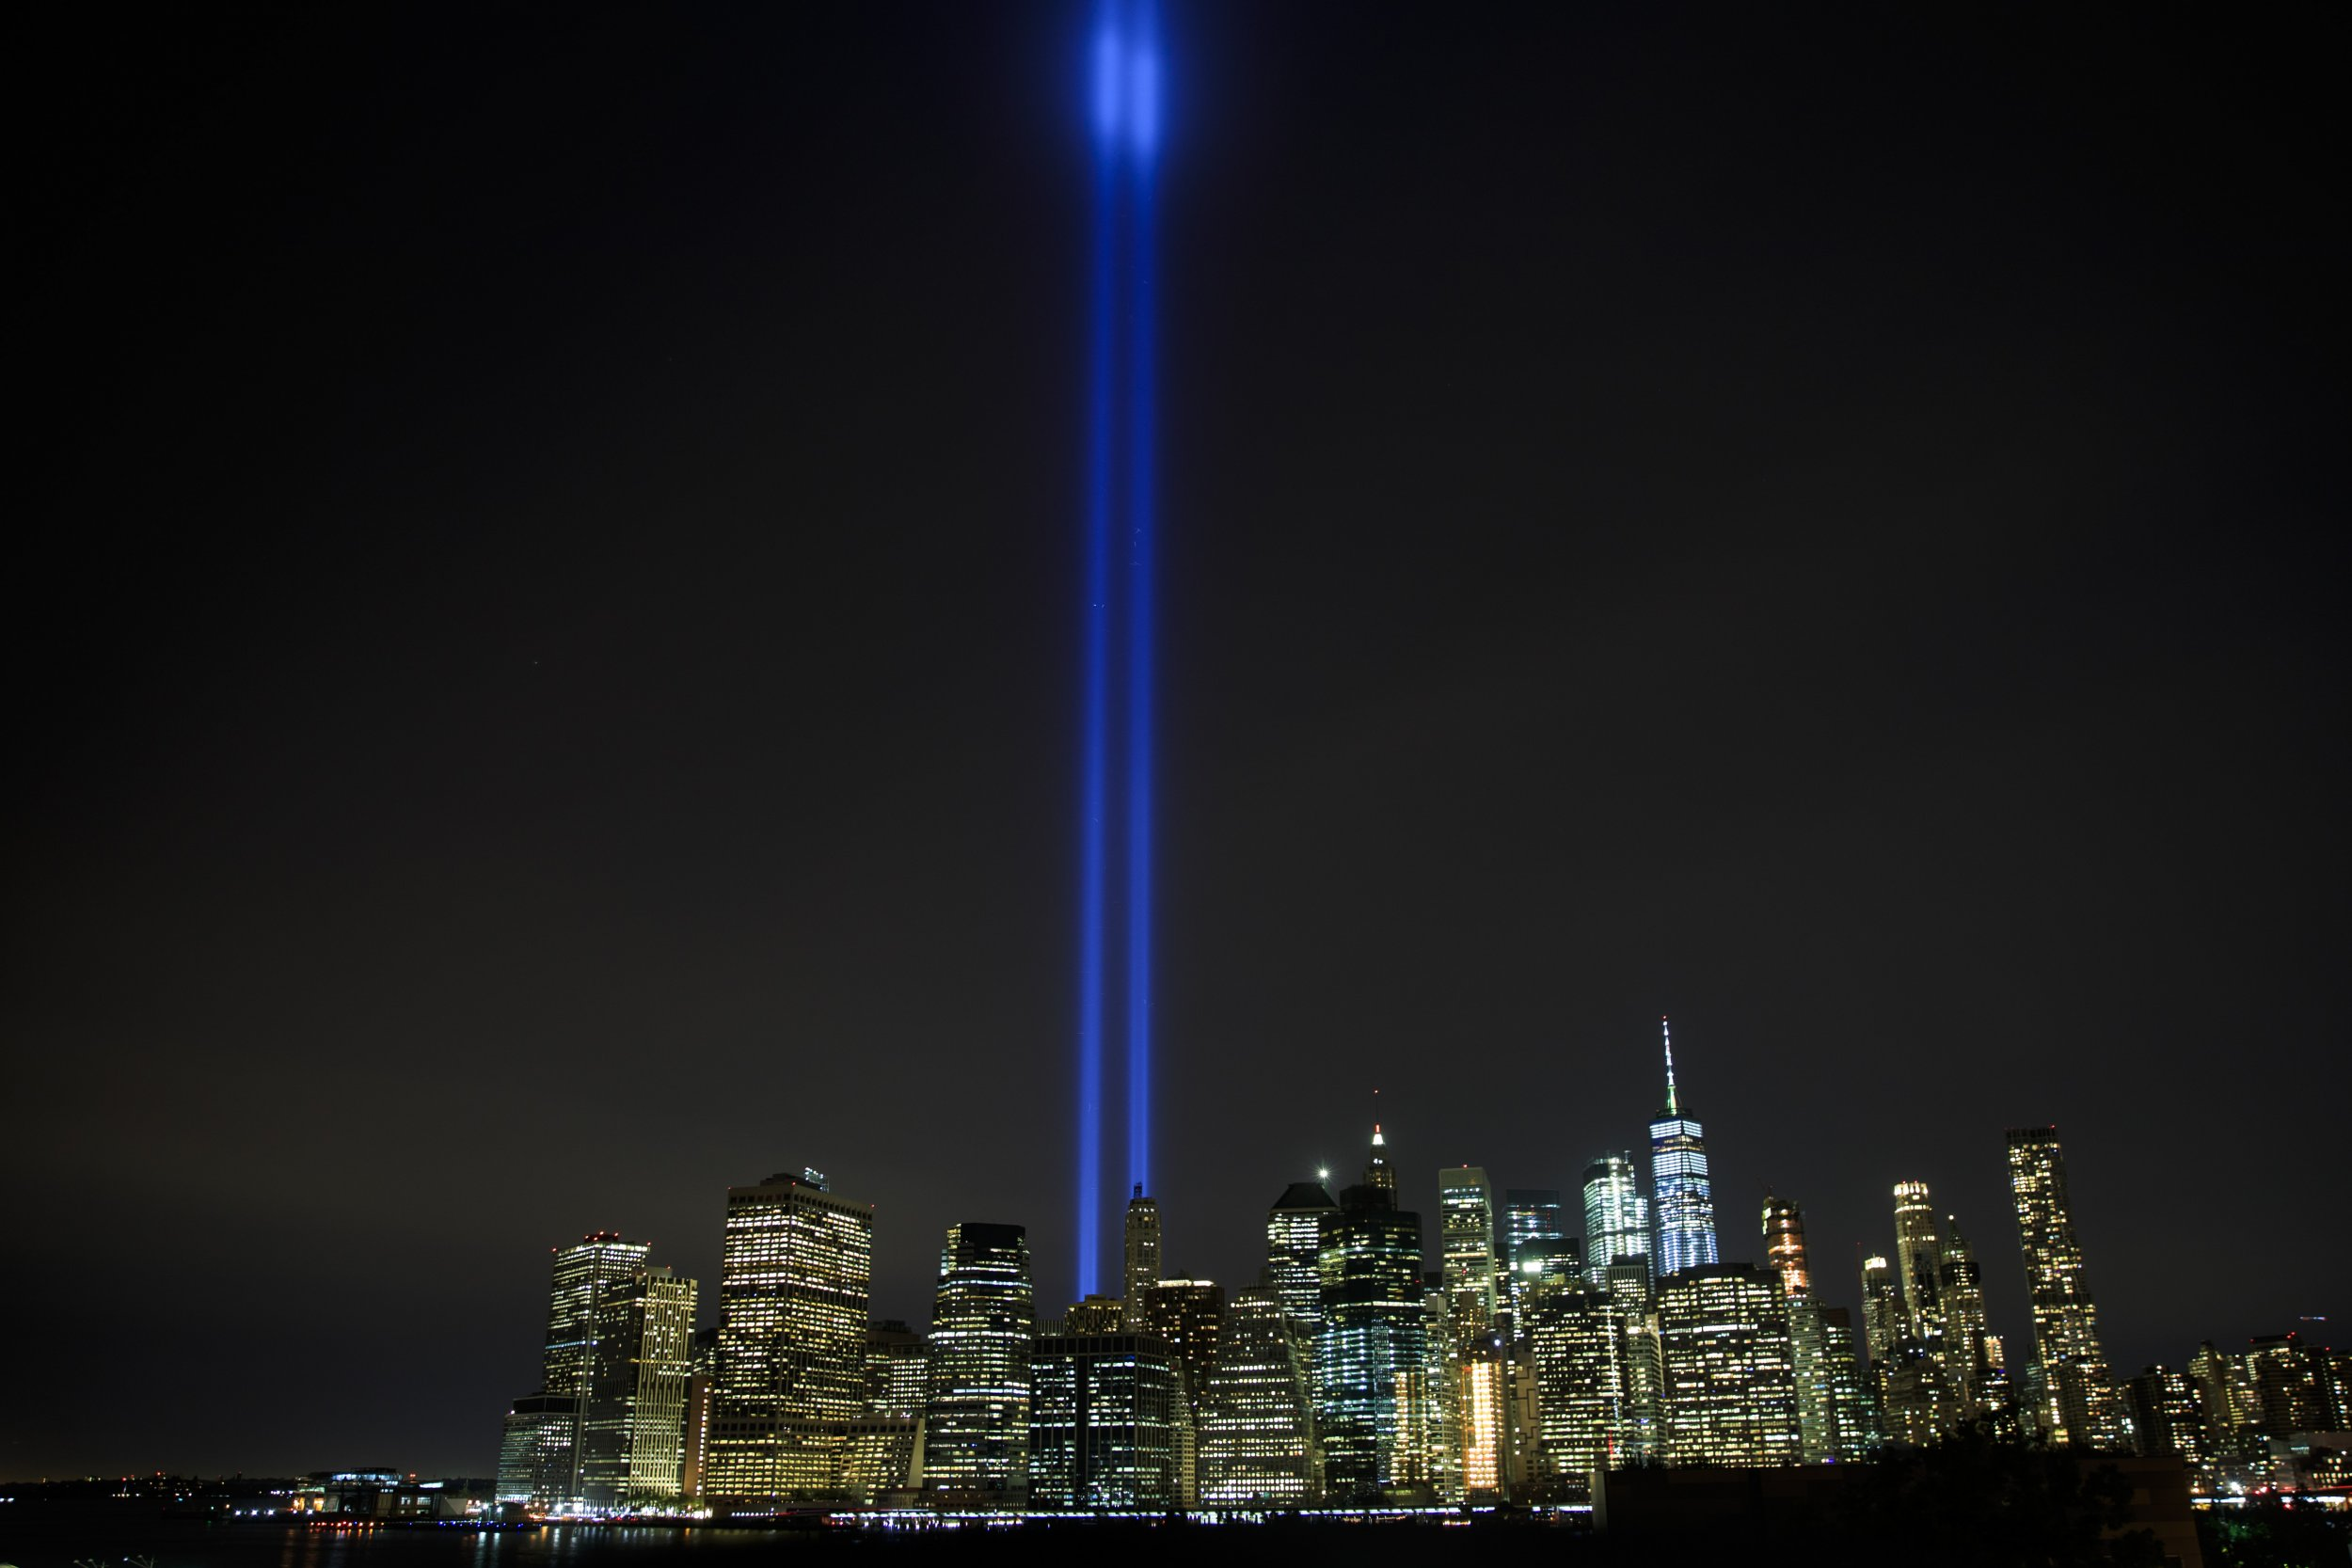 donald trump 9/11 never forget rudy giuliani